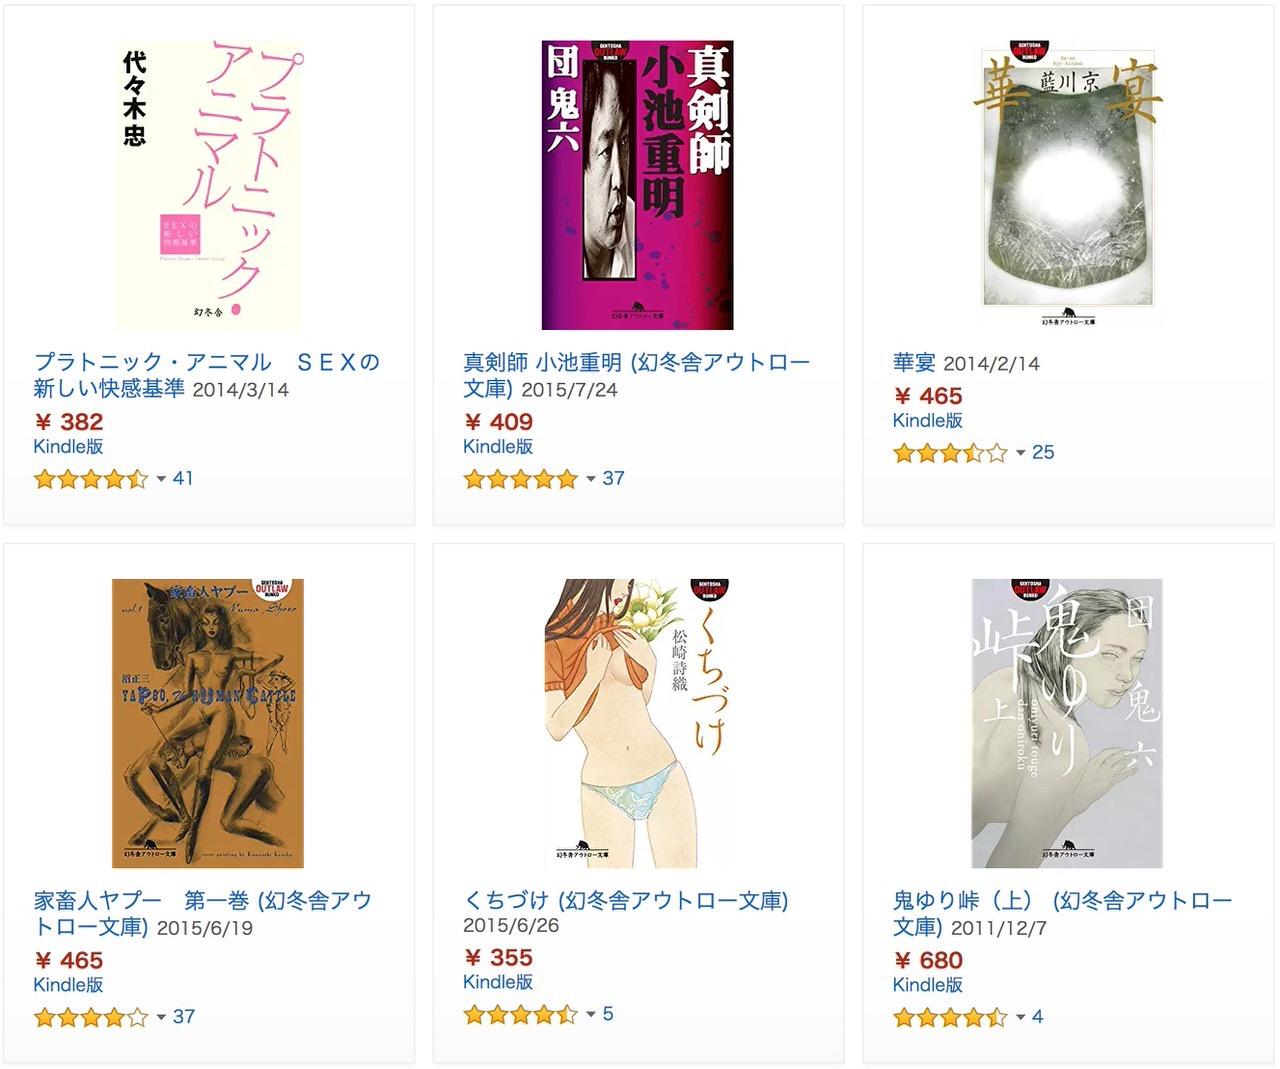 【Kindleセール】30%OFF「凶悪、衝撃、問題作続々!夏の度胸試し本フェア」(7/26まで)